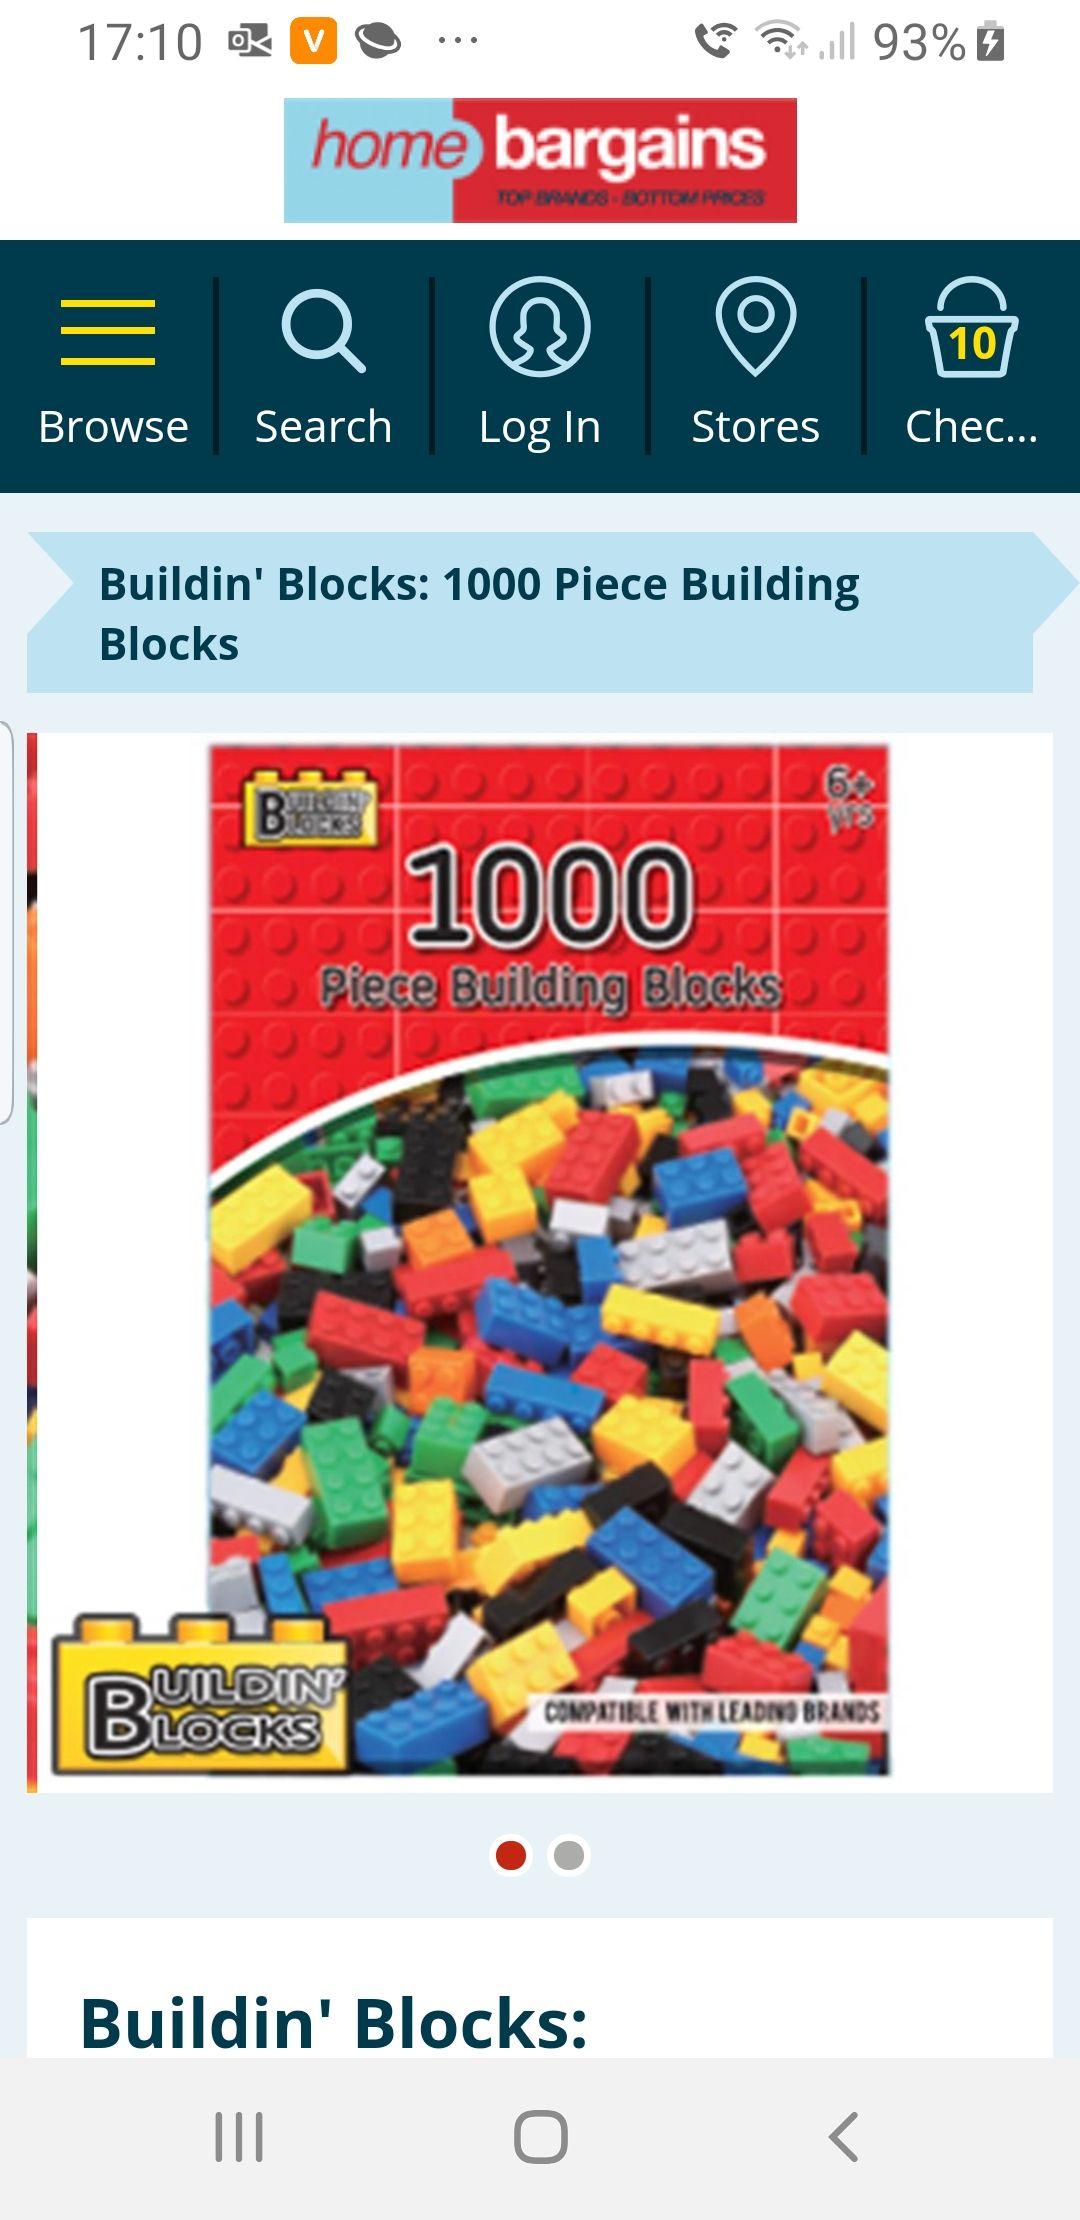 Buildin' Blocks: 1000 Piece Building Blocks £9.99 (+£3.49 delivery) @ Home Bargains